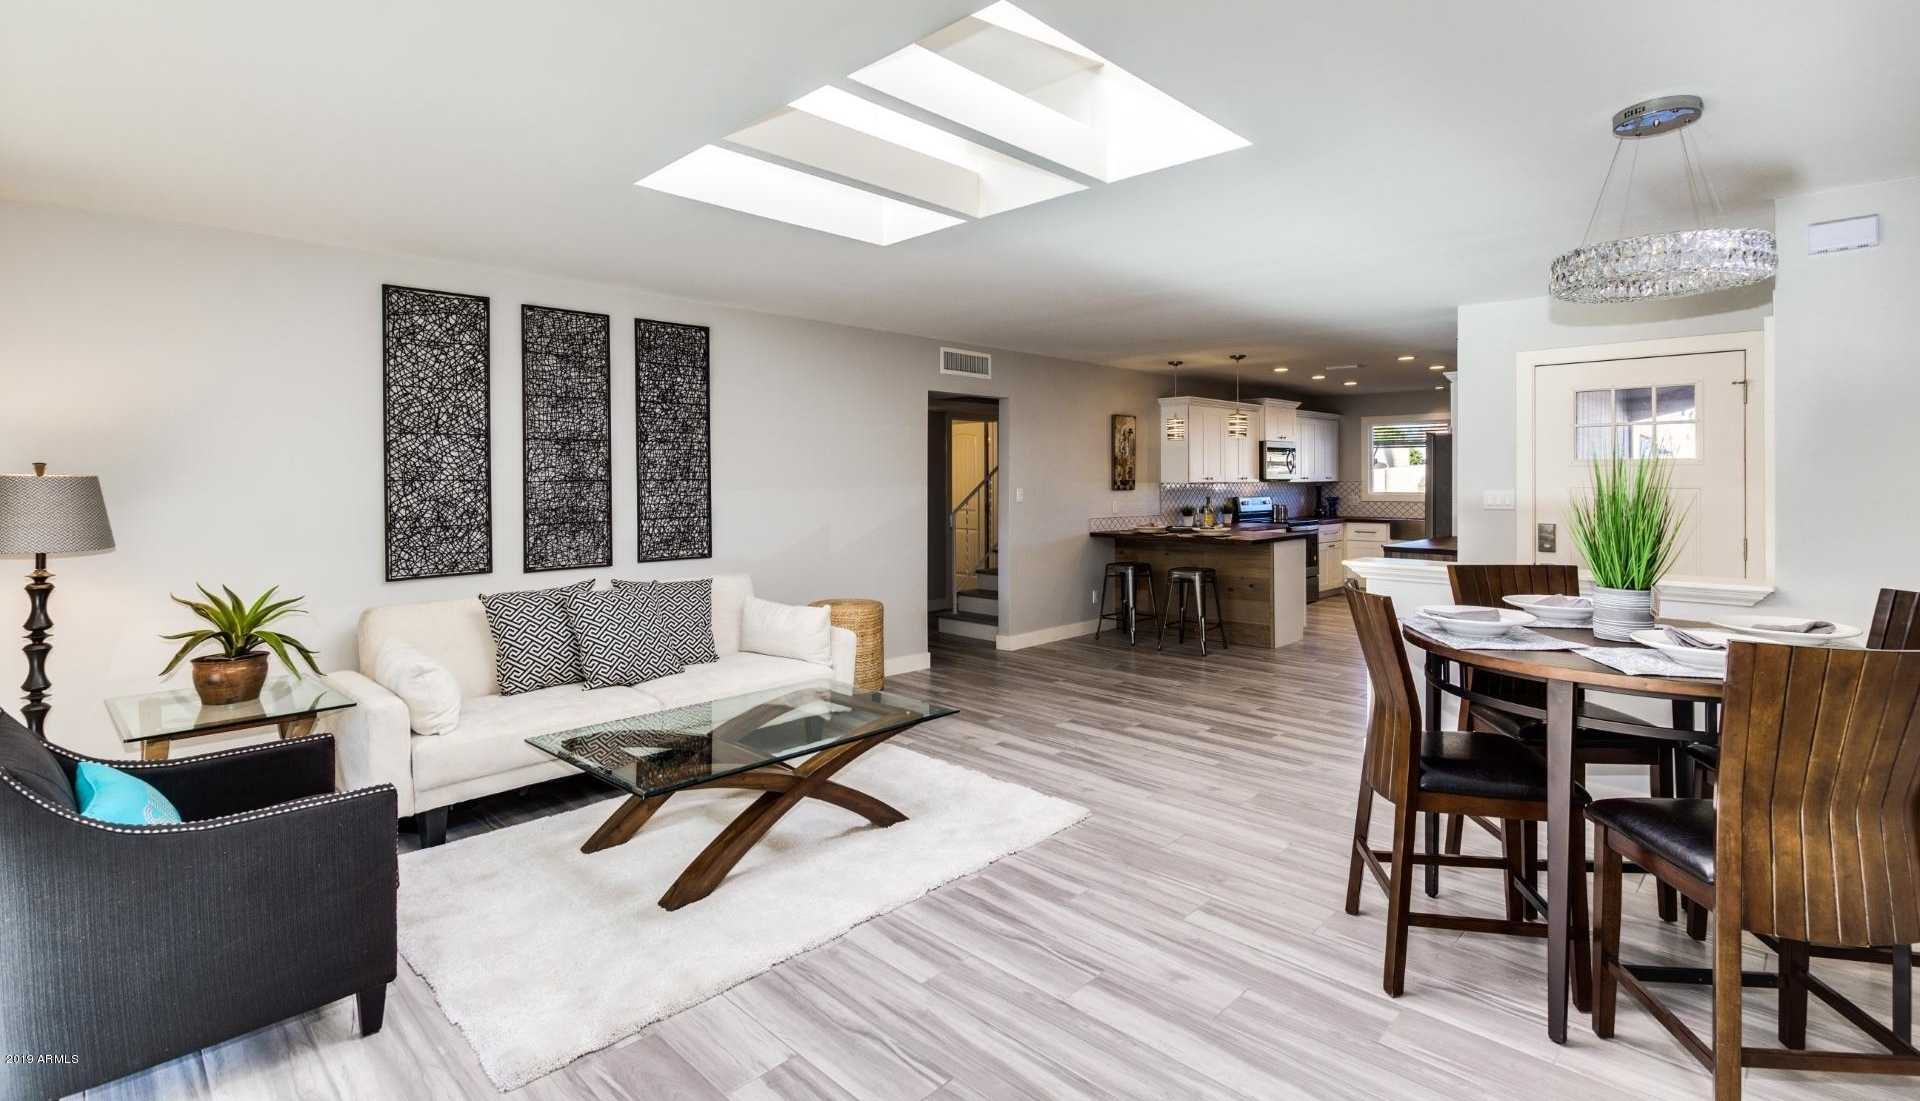 $483,900 - 3Br/3Ba -  for Sale in Villa Monterey 3a, Scottsdale